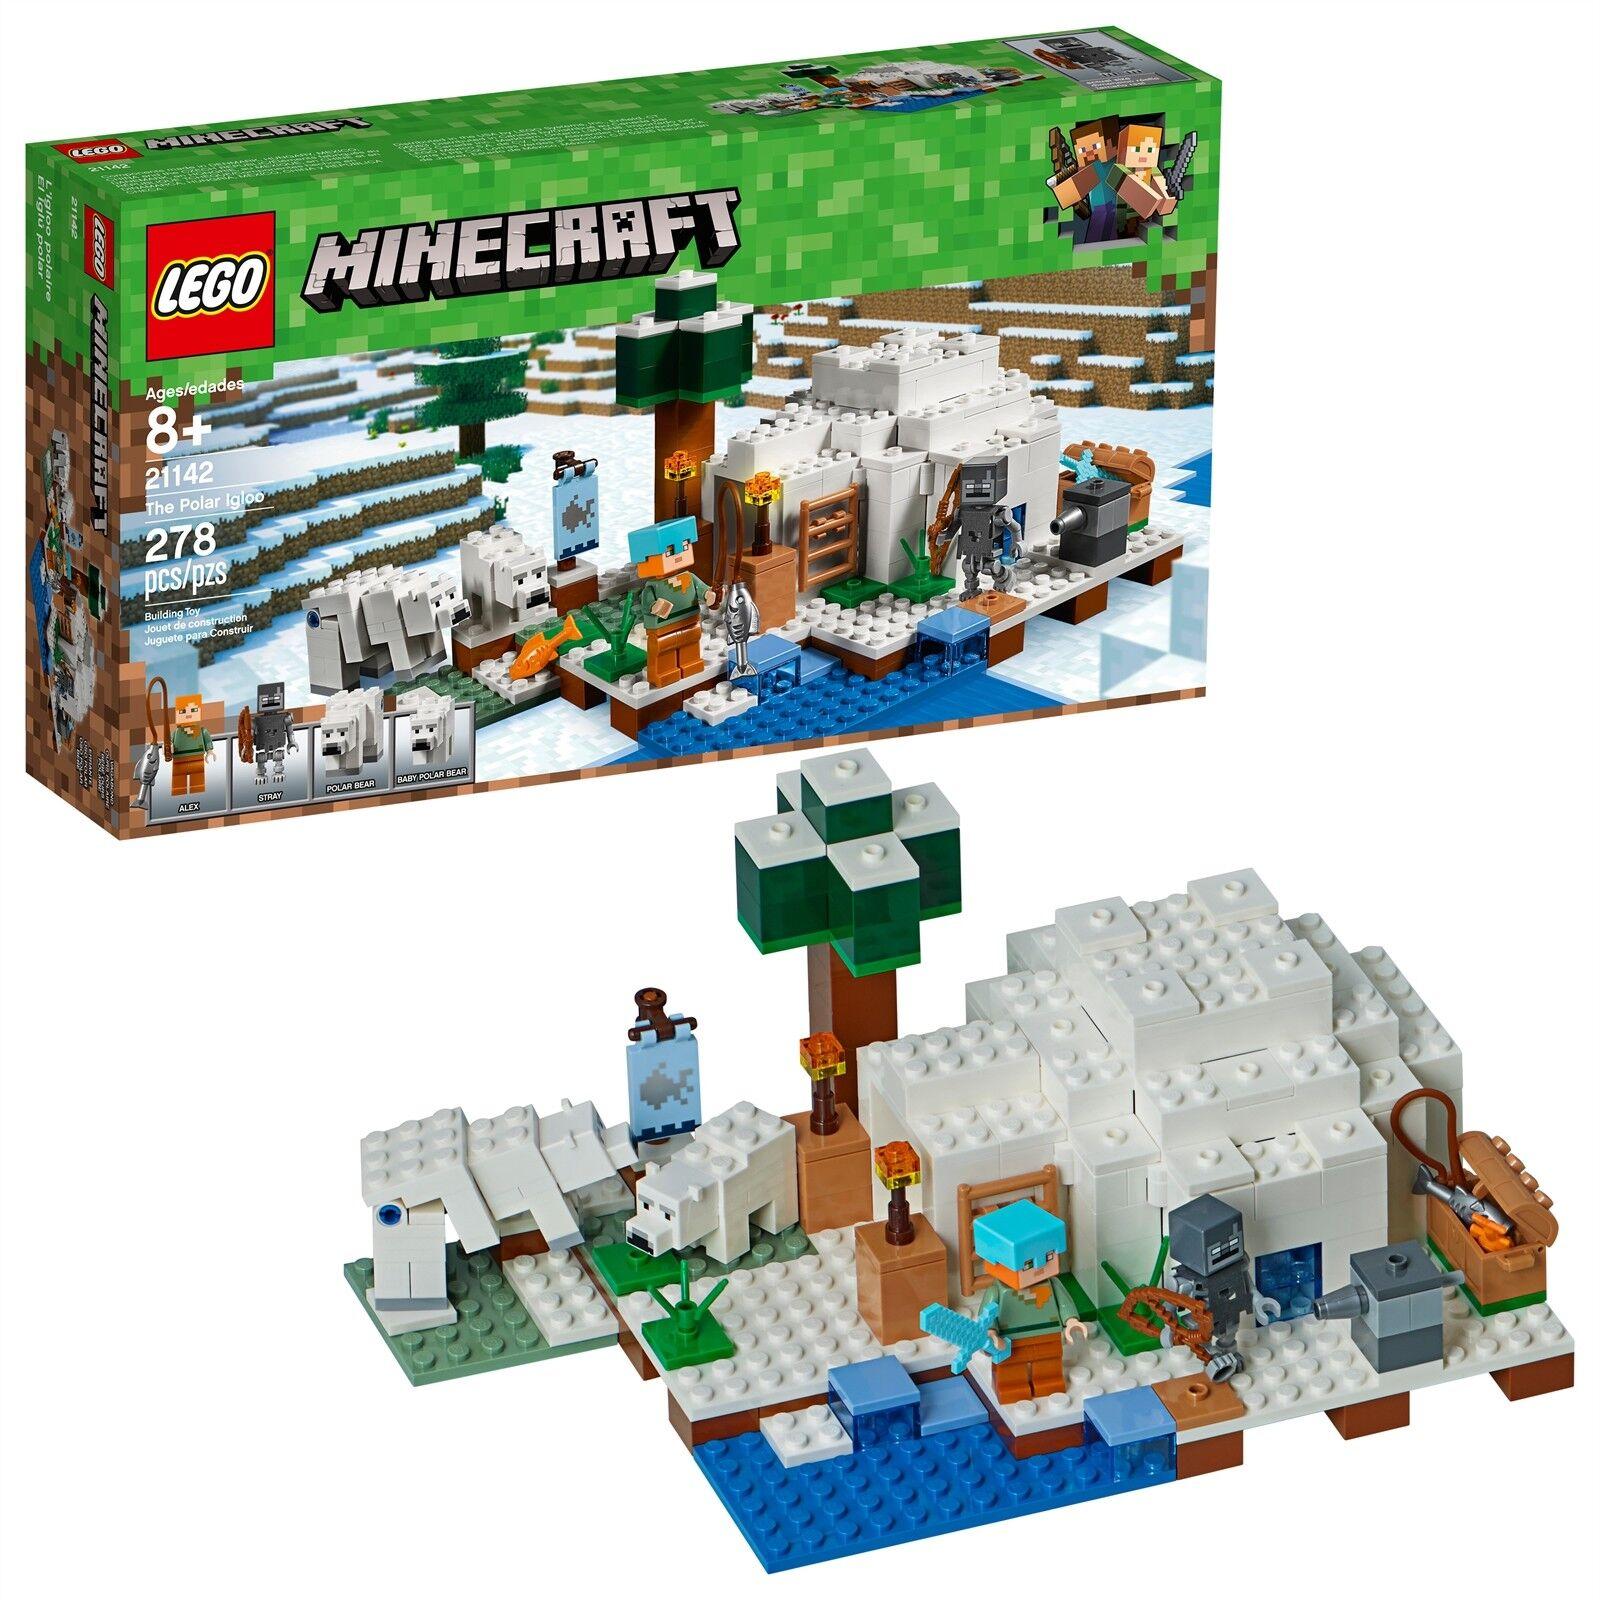 LEGO® Minecraft™ The Polar Igloo 21142 278 Pcs